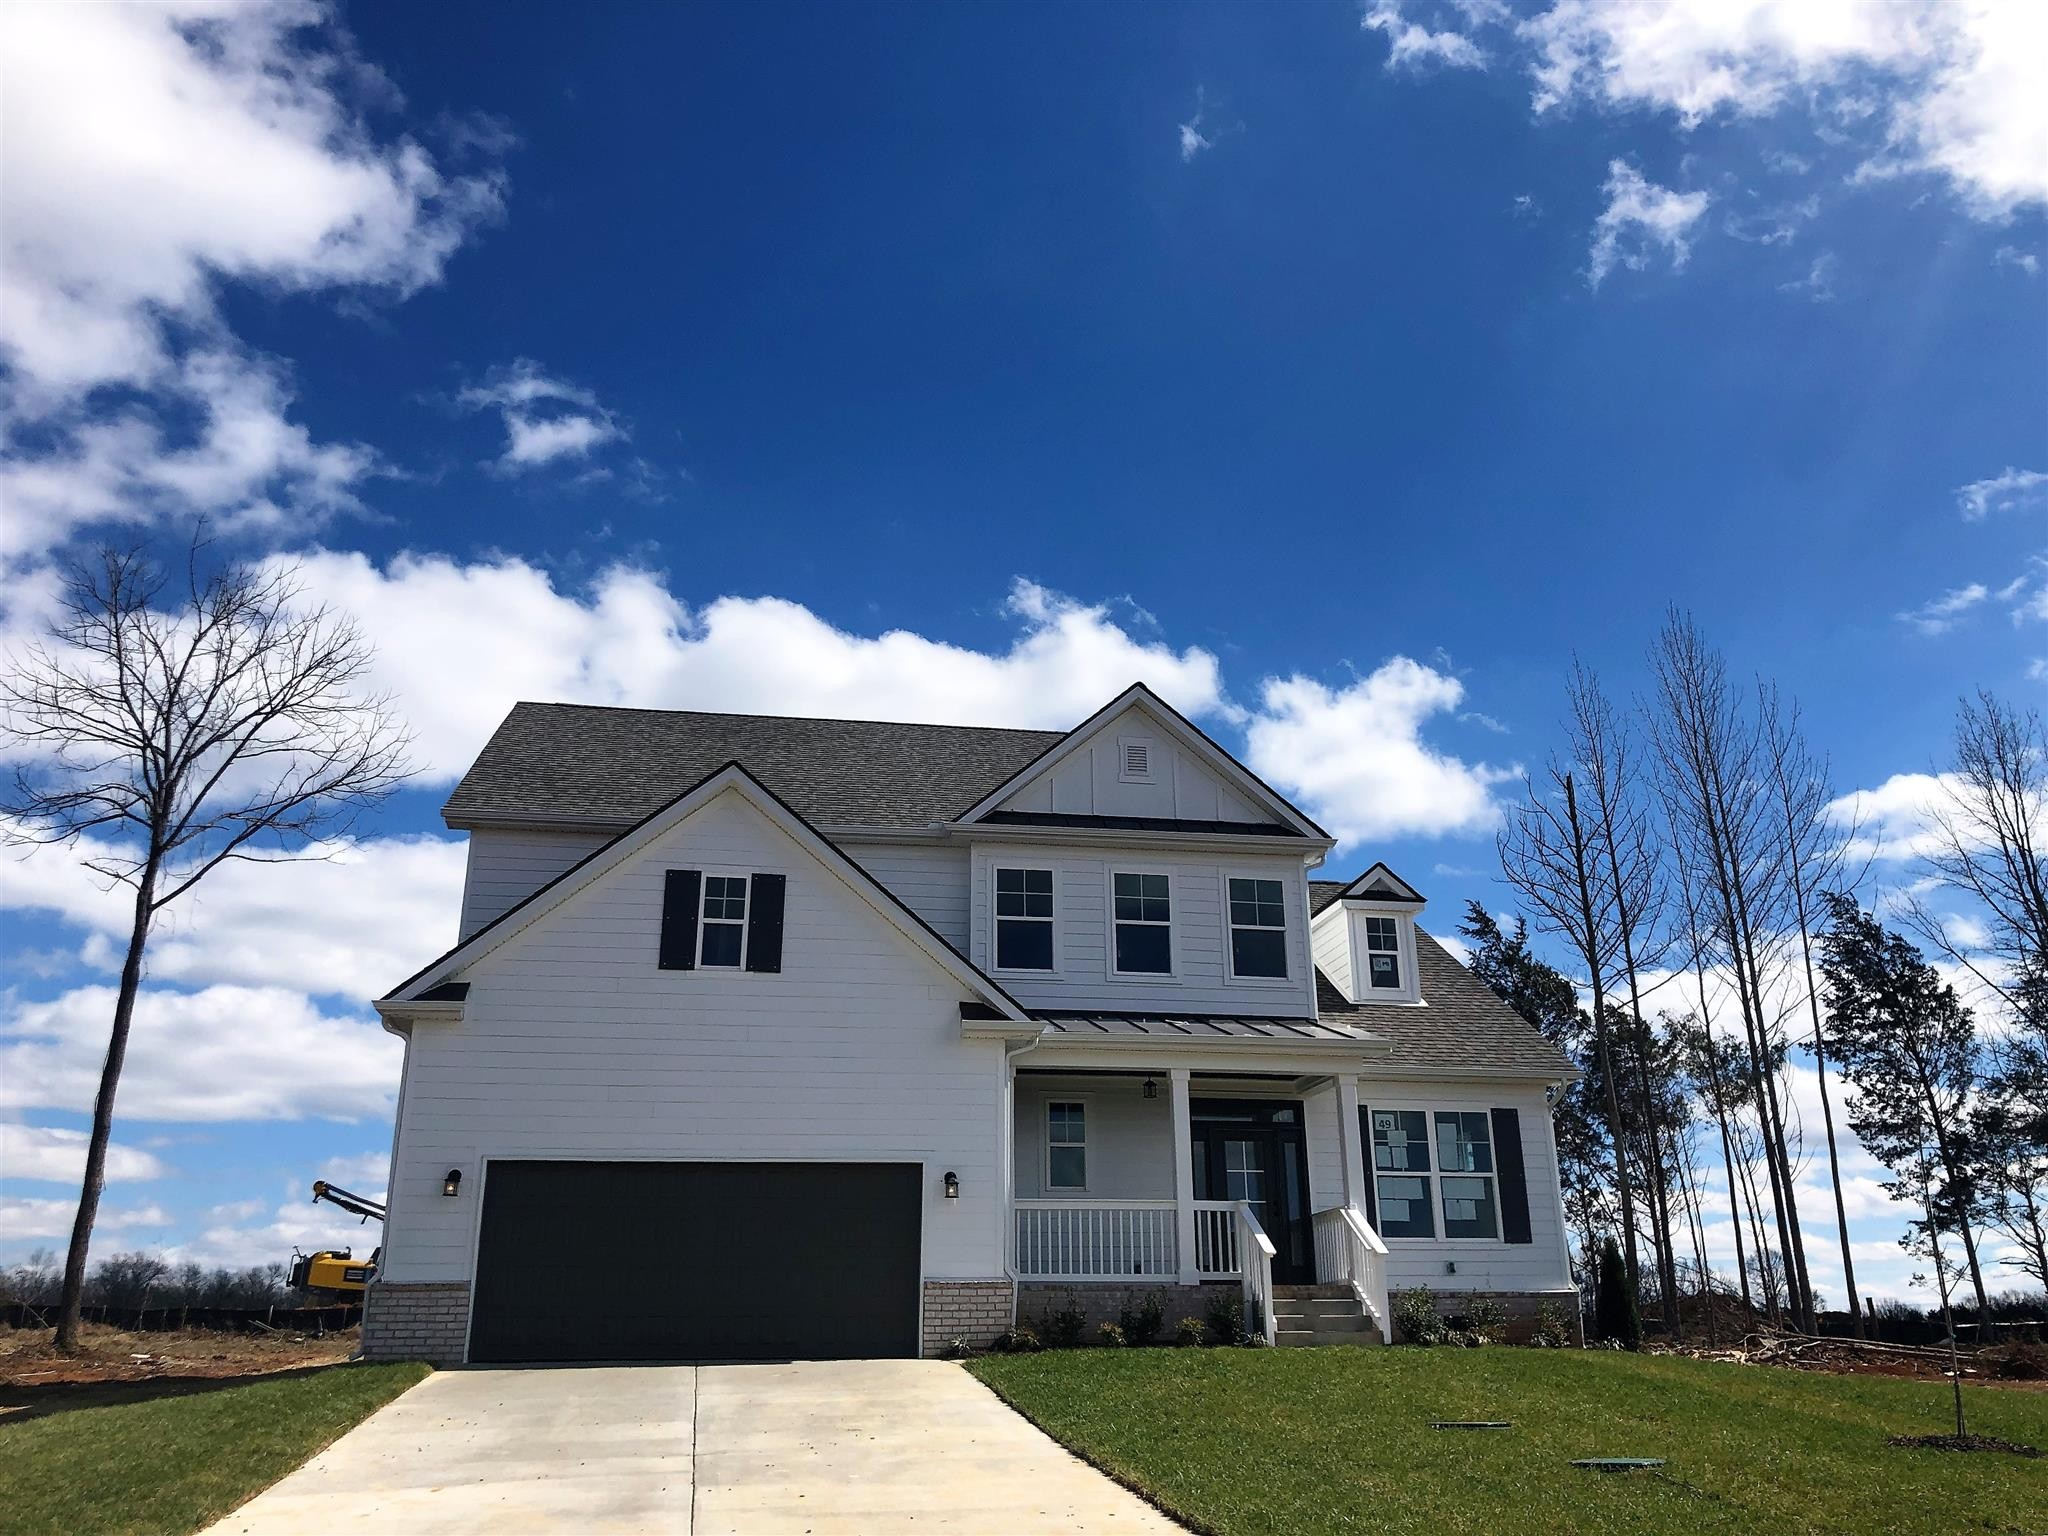 1229 Batbriar Rd #49, Murfreesboro, TN 37128 - Murfreesboro, TN real estate listing